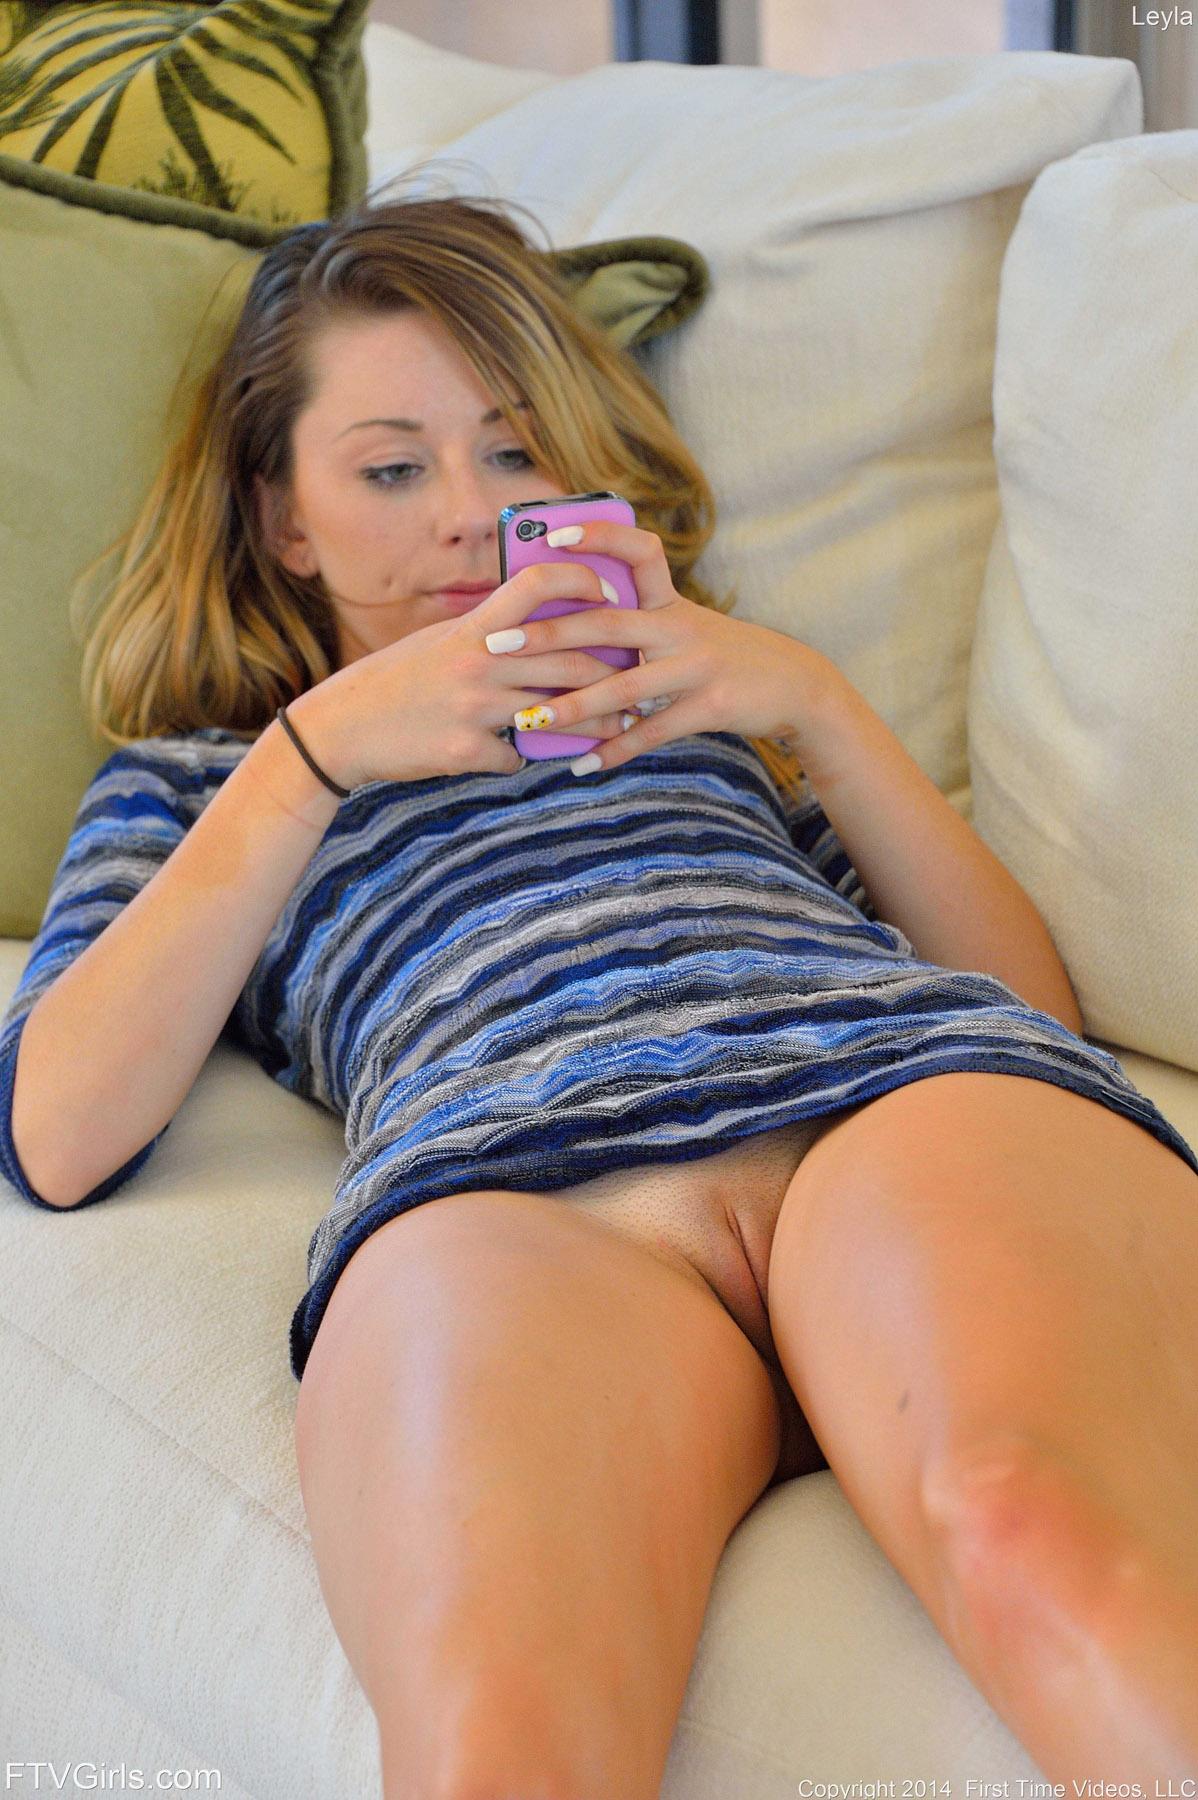 ftv leyla nudity Public